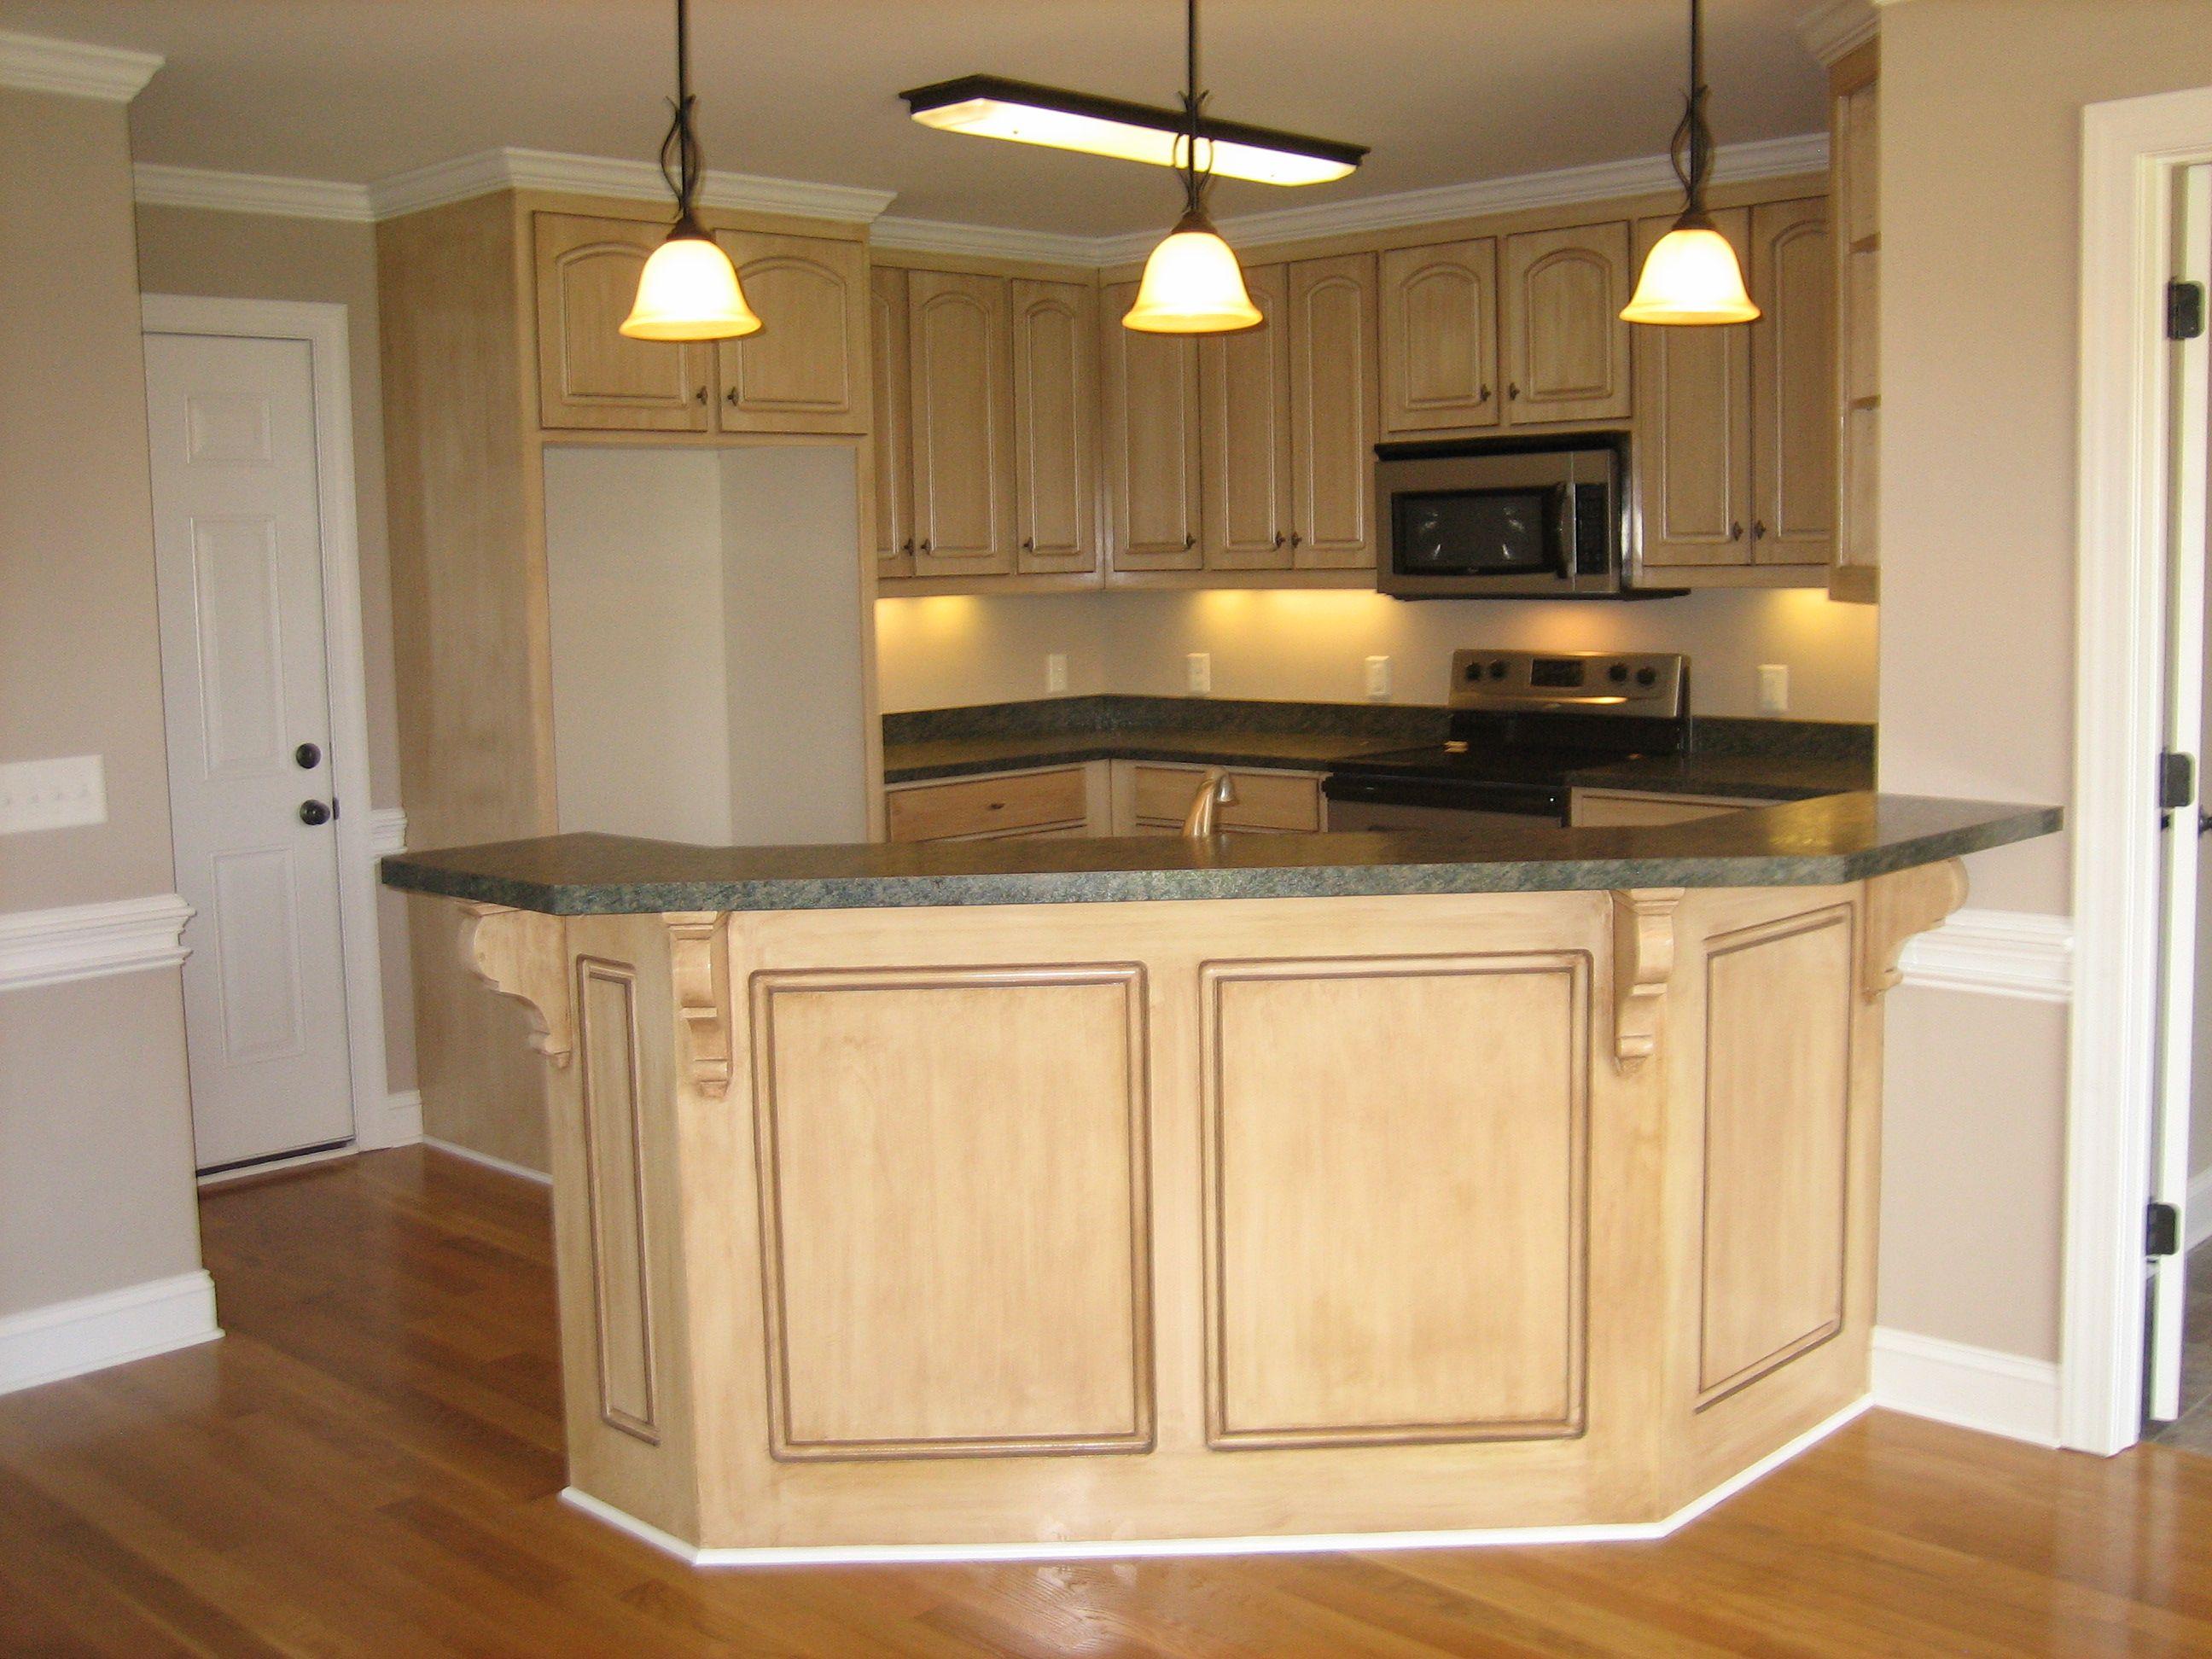 Counter Back Idea Kitchen Custom Homes Home